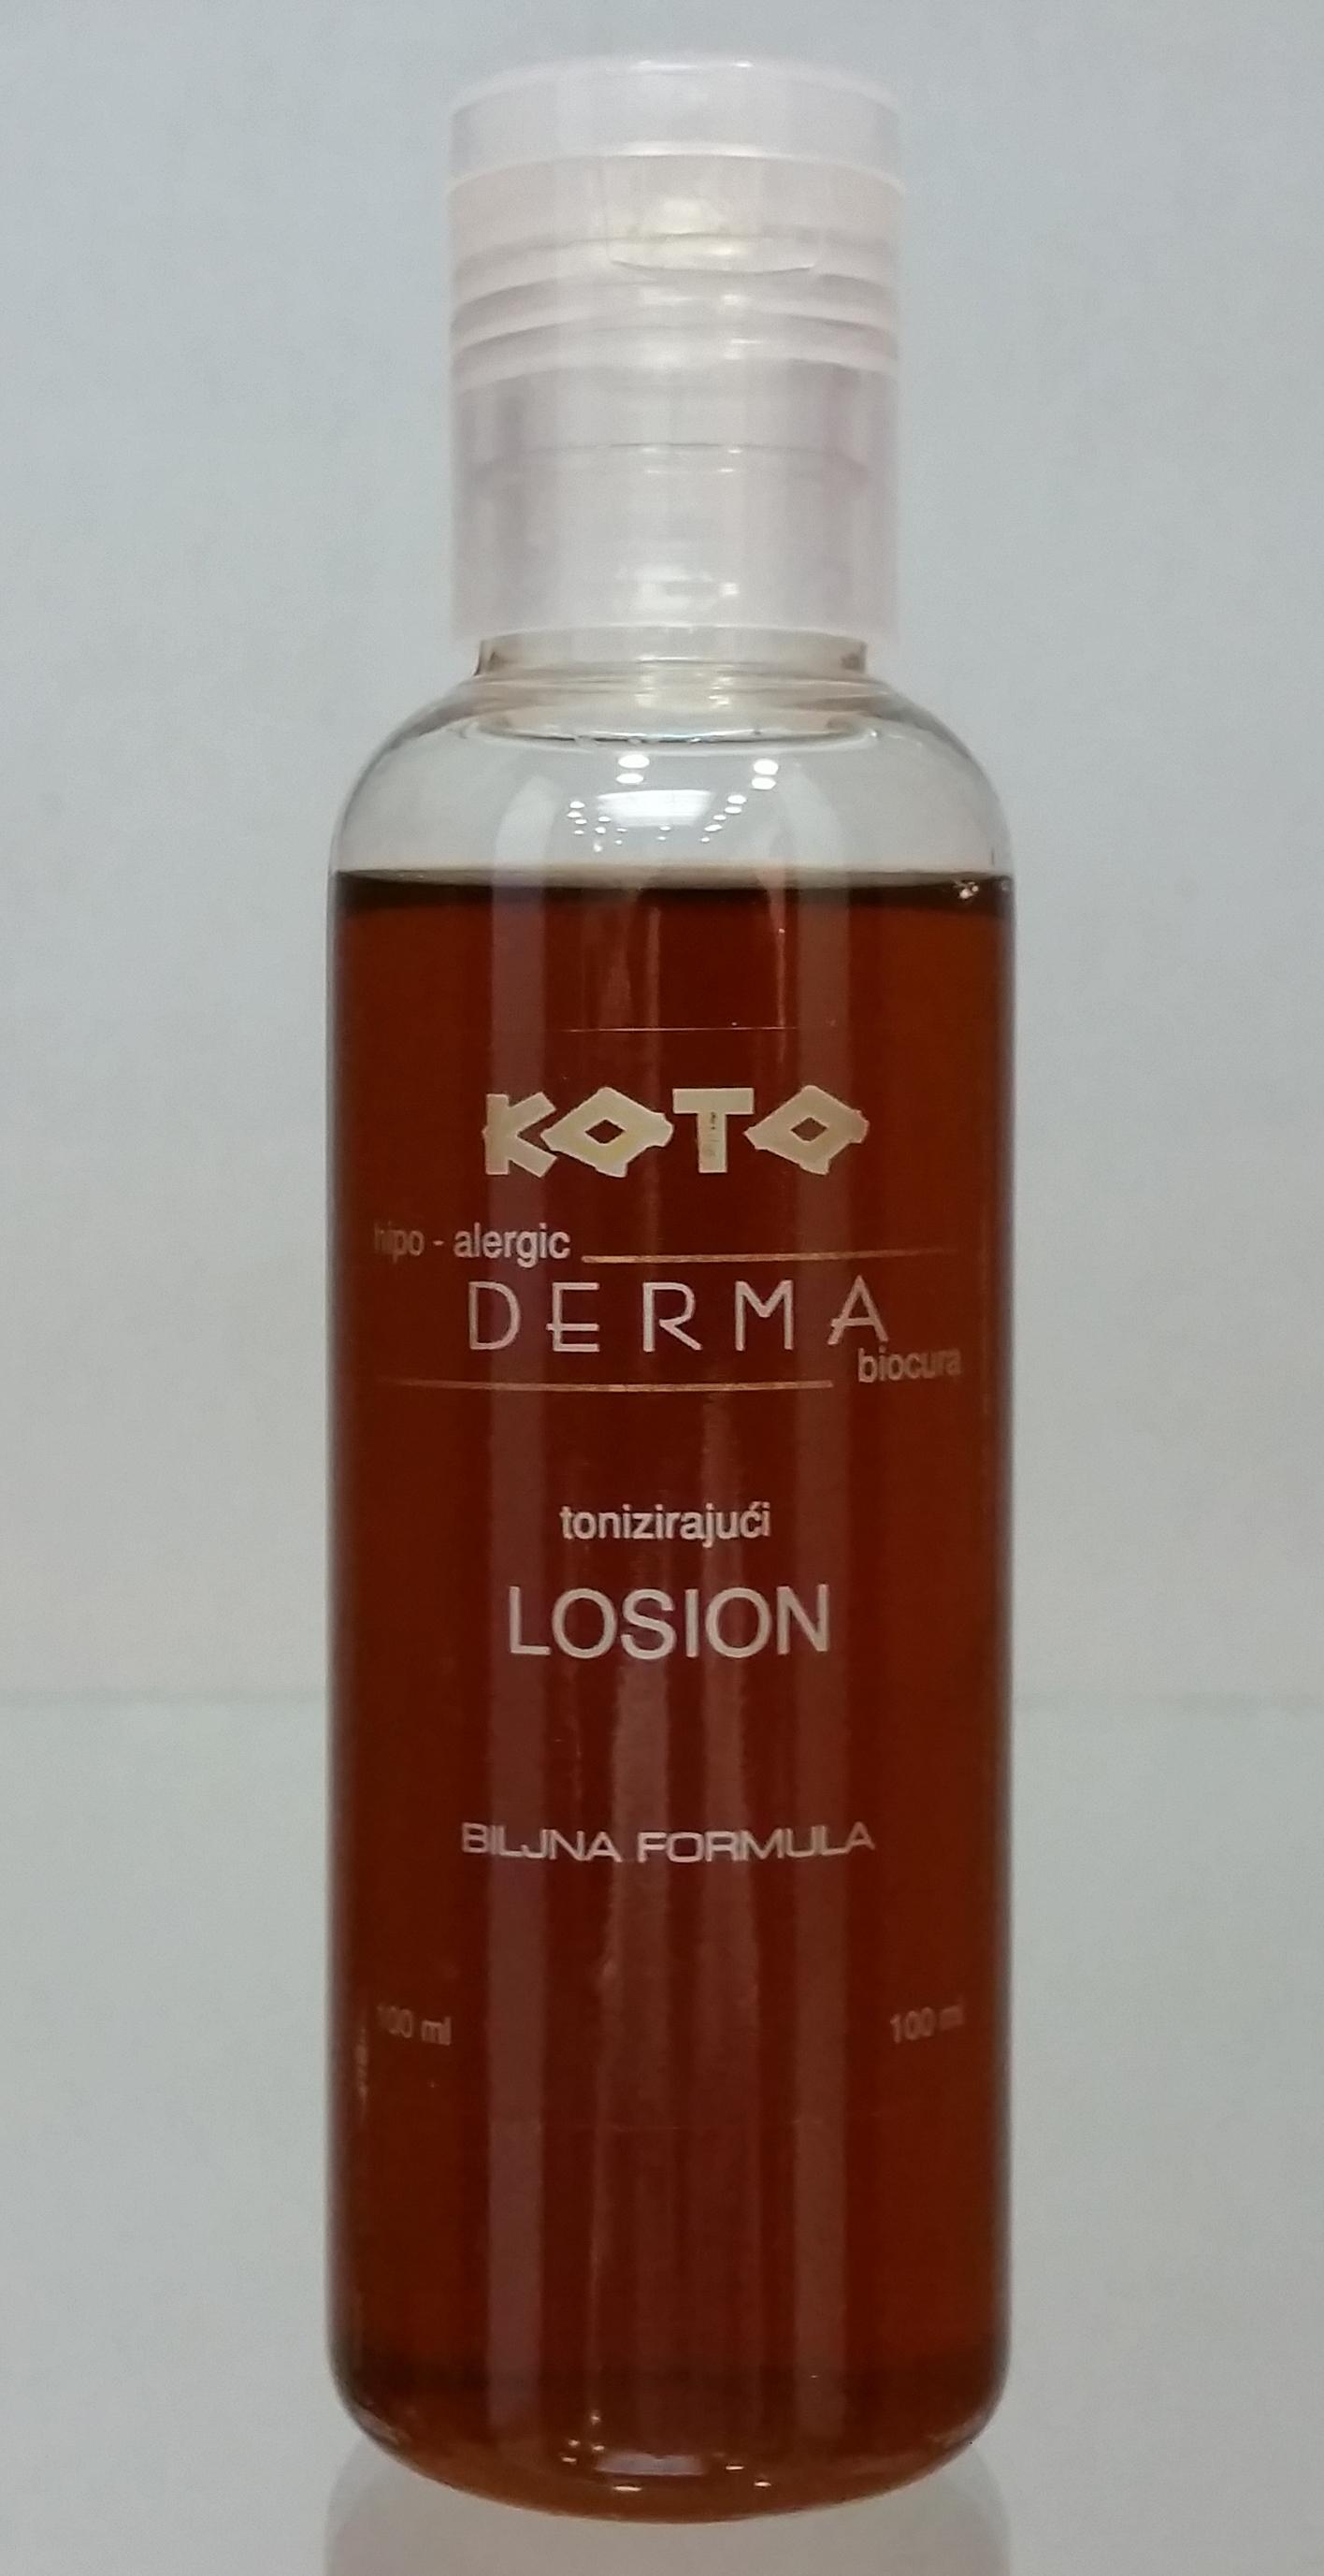 Tonizirajuci losion biljna formula